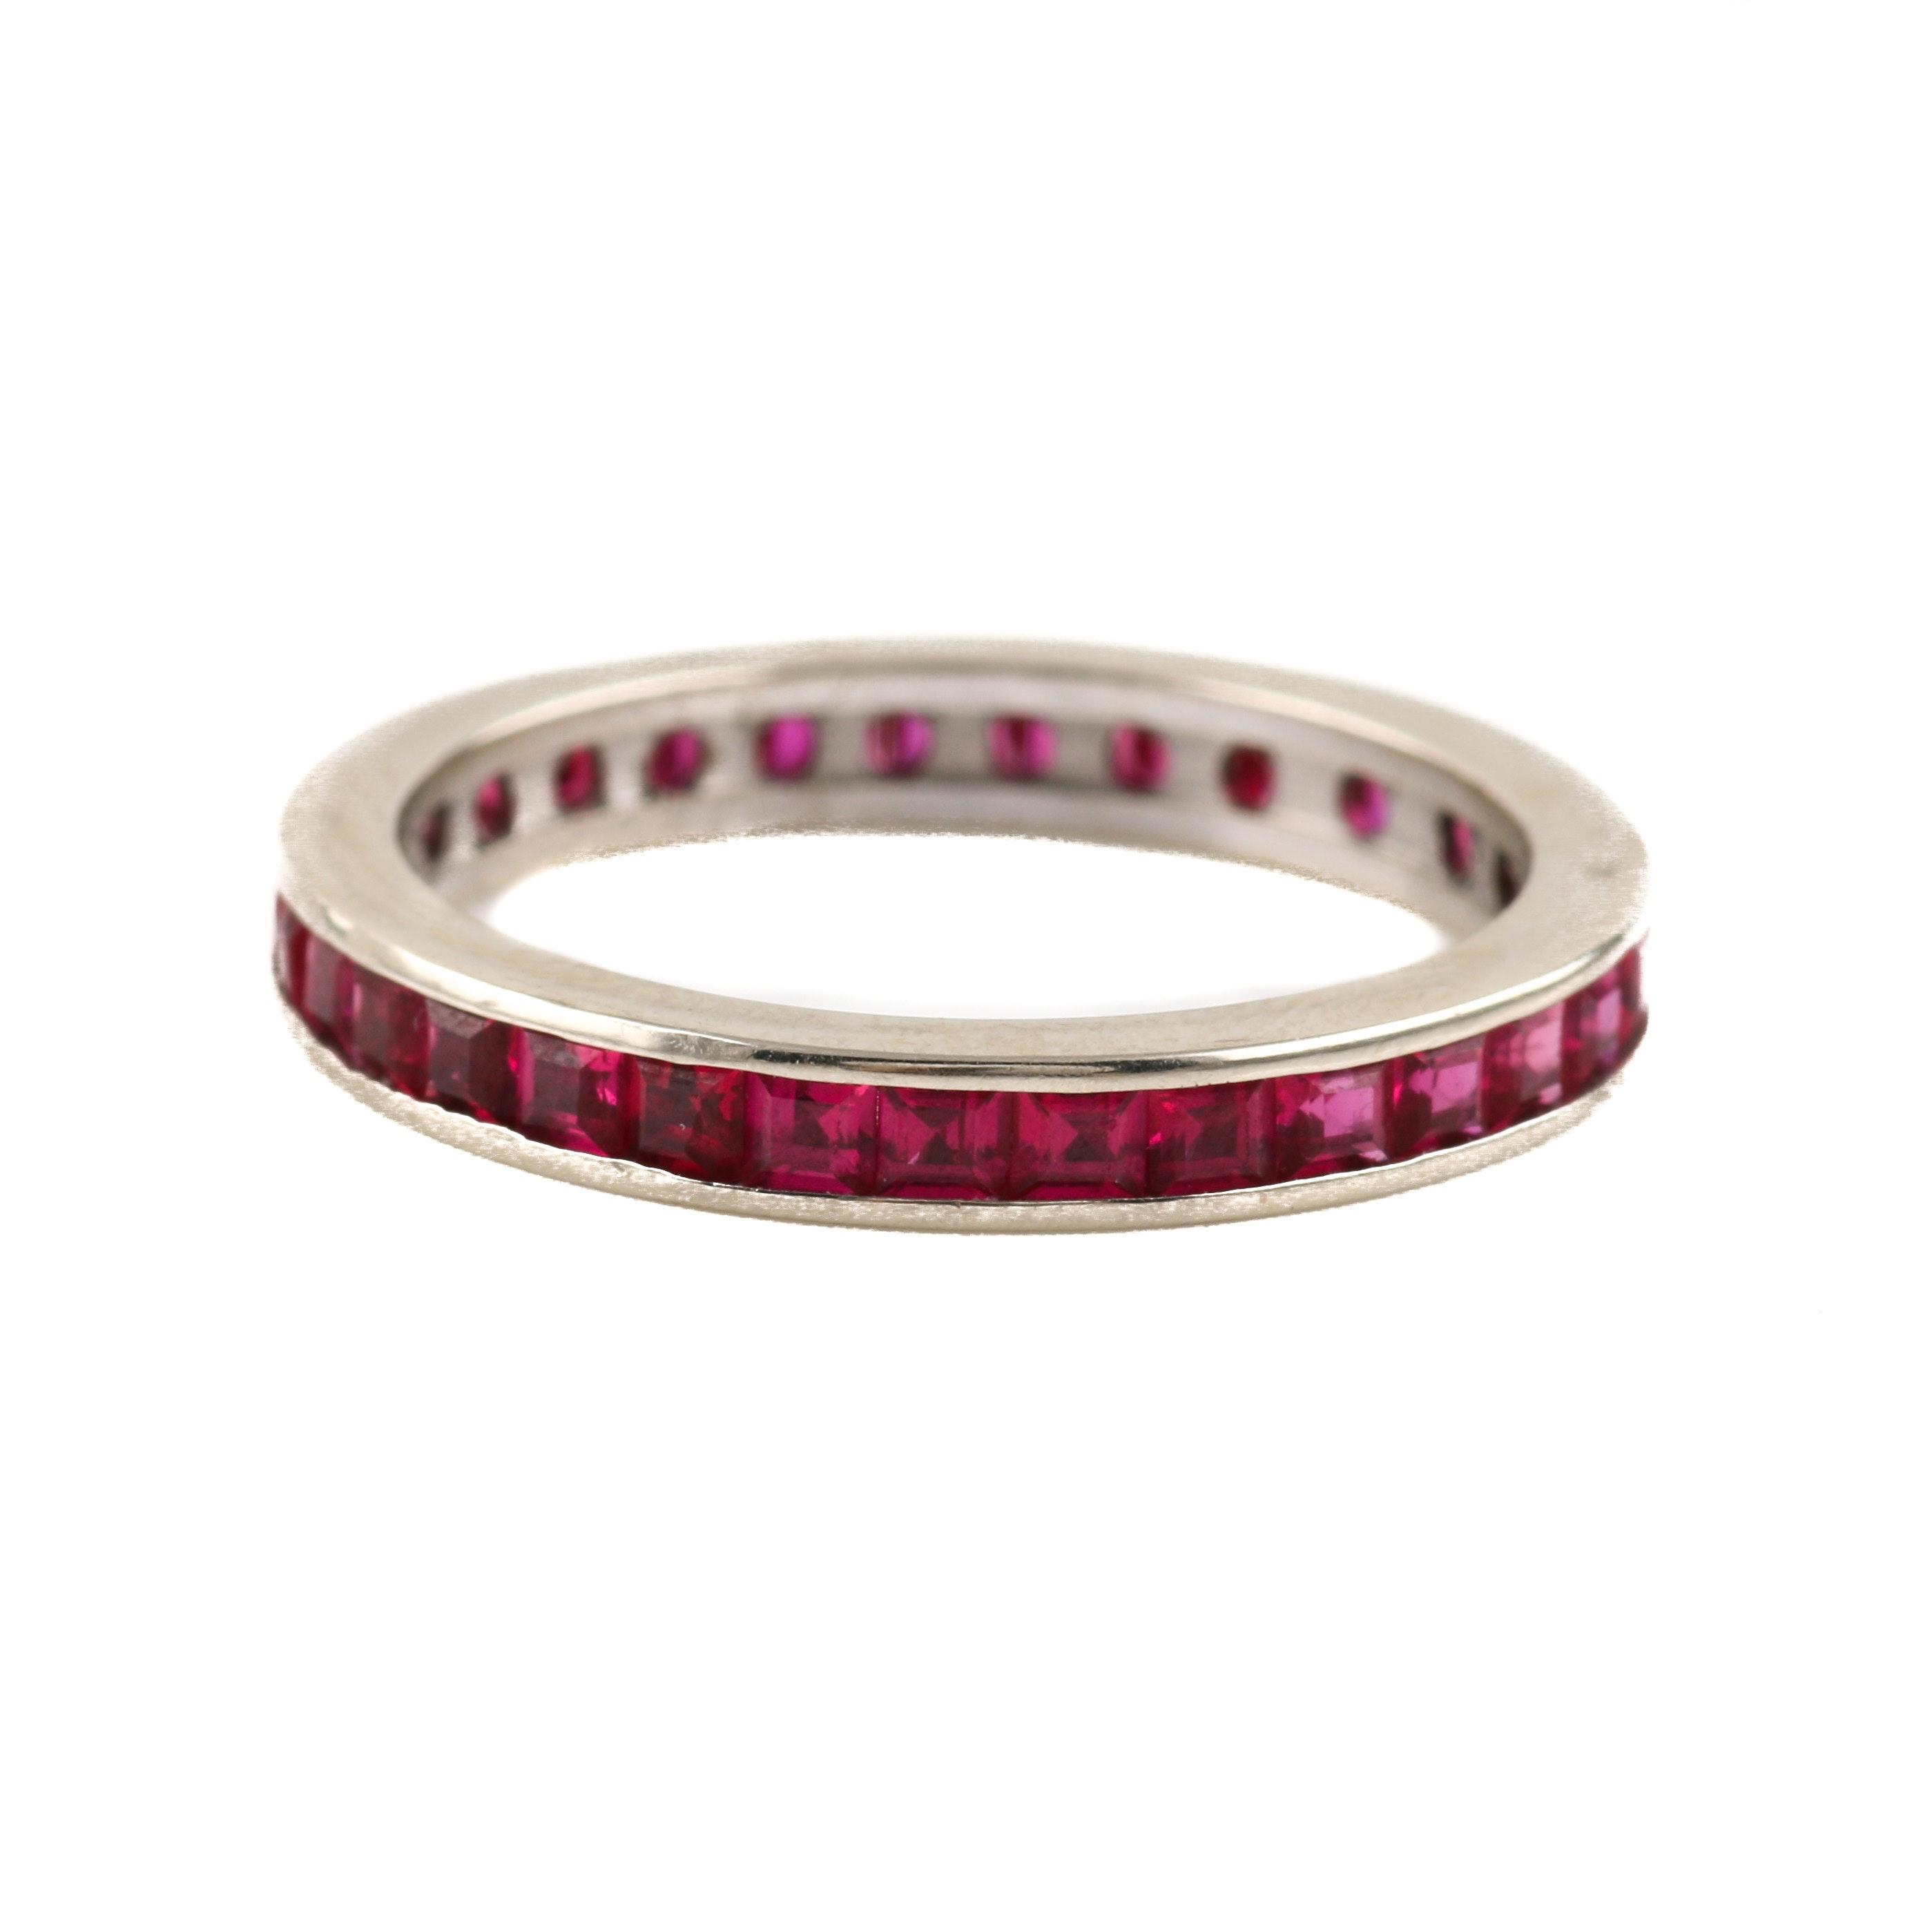 14K White Gold Ruby Eternity Ring Band